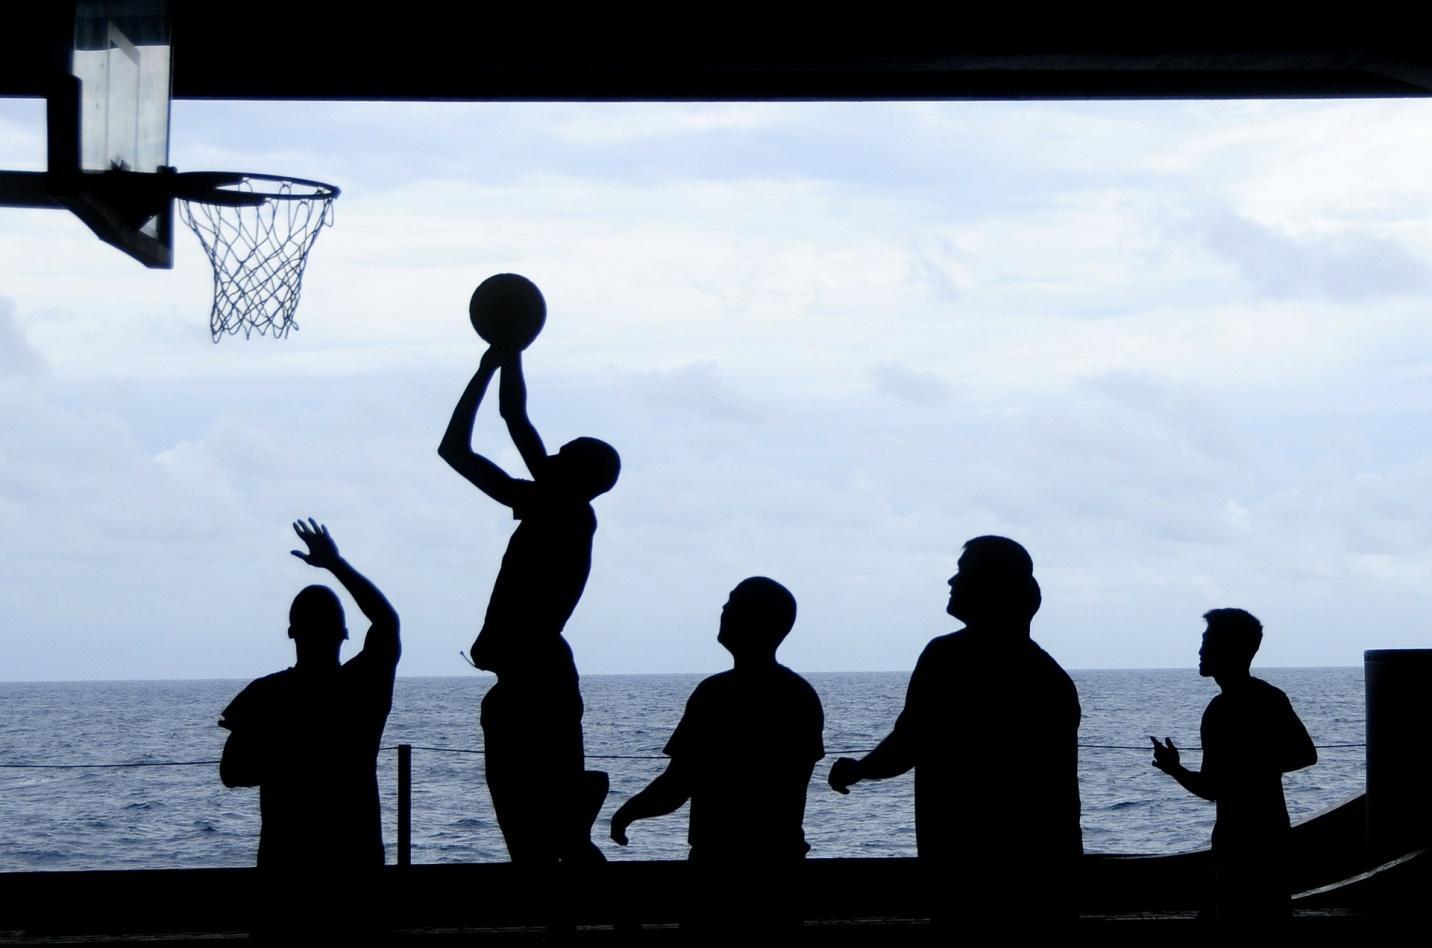 C:\Users\admin\Downloads\basketball-108622_1920.jpg